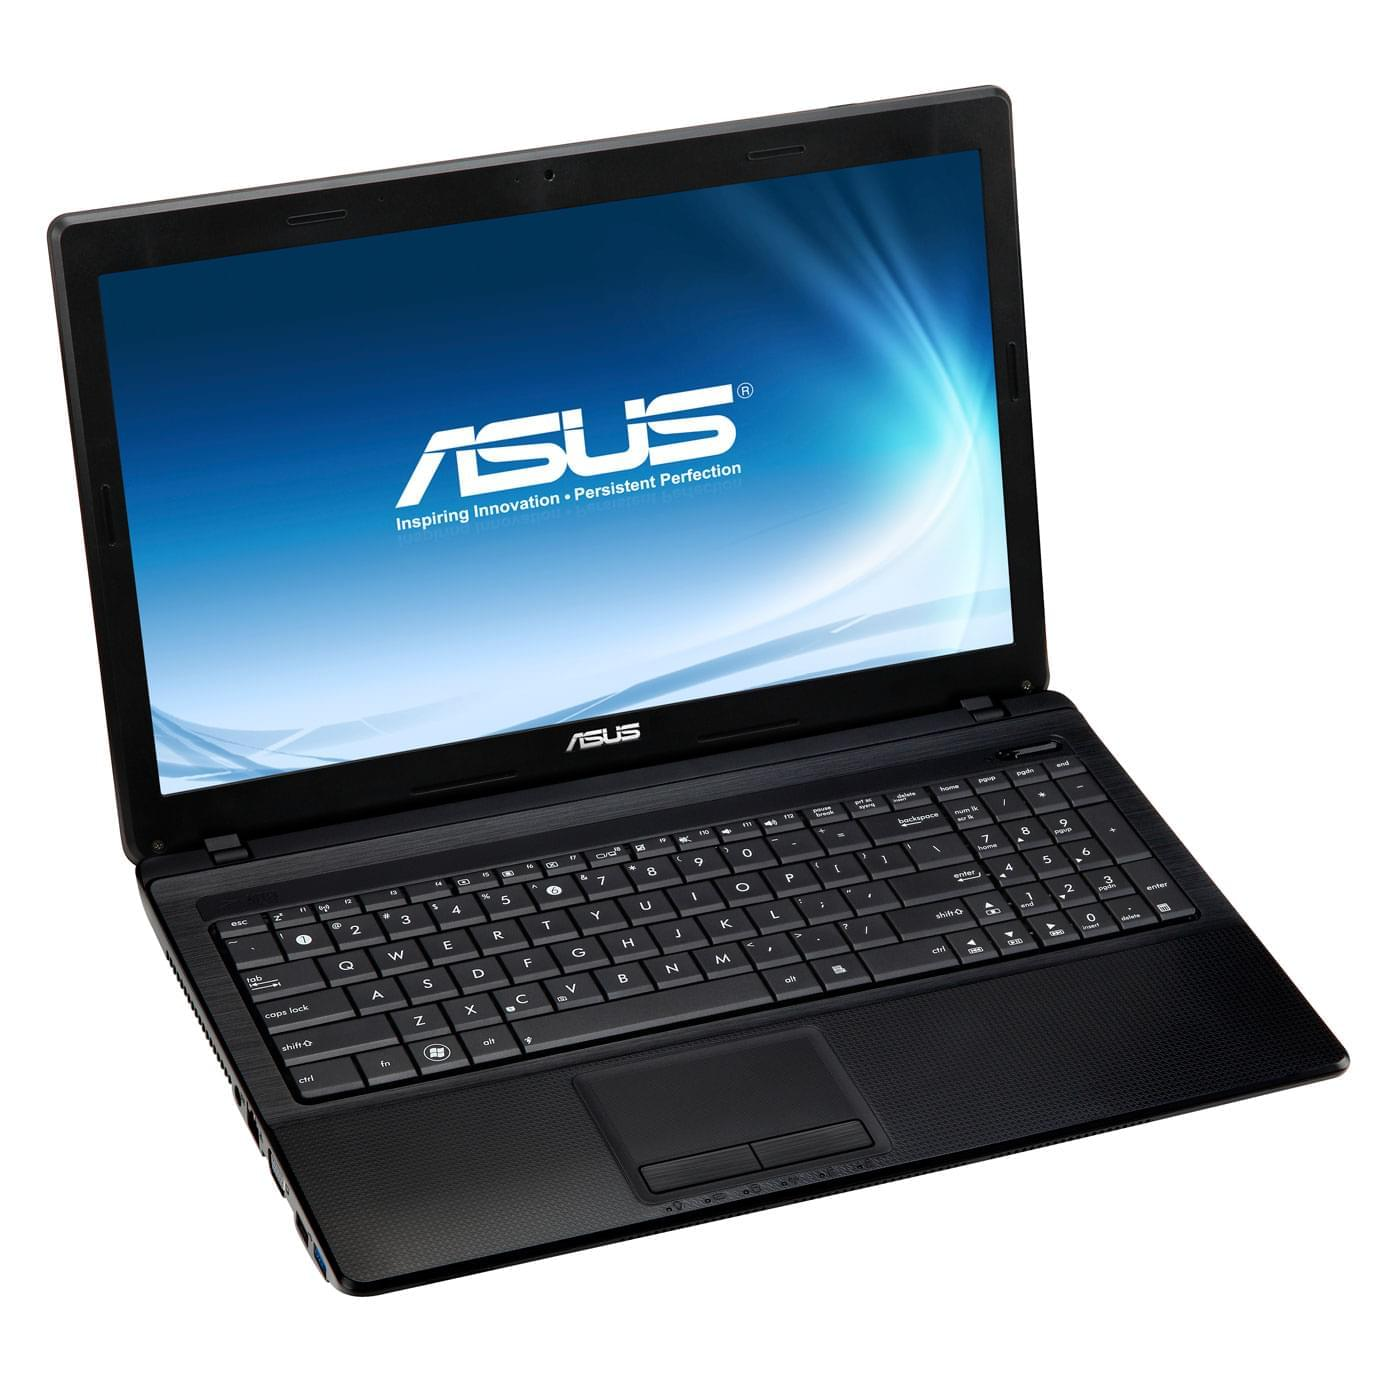 Asus X54C-SX034V (X54C-SX034V) - Achat / Vente PC Portable sur Cybertek.fr - 0